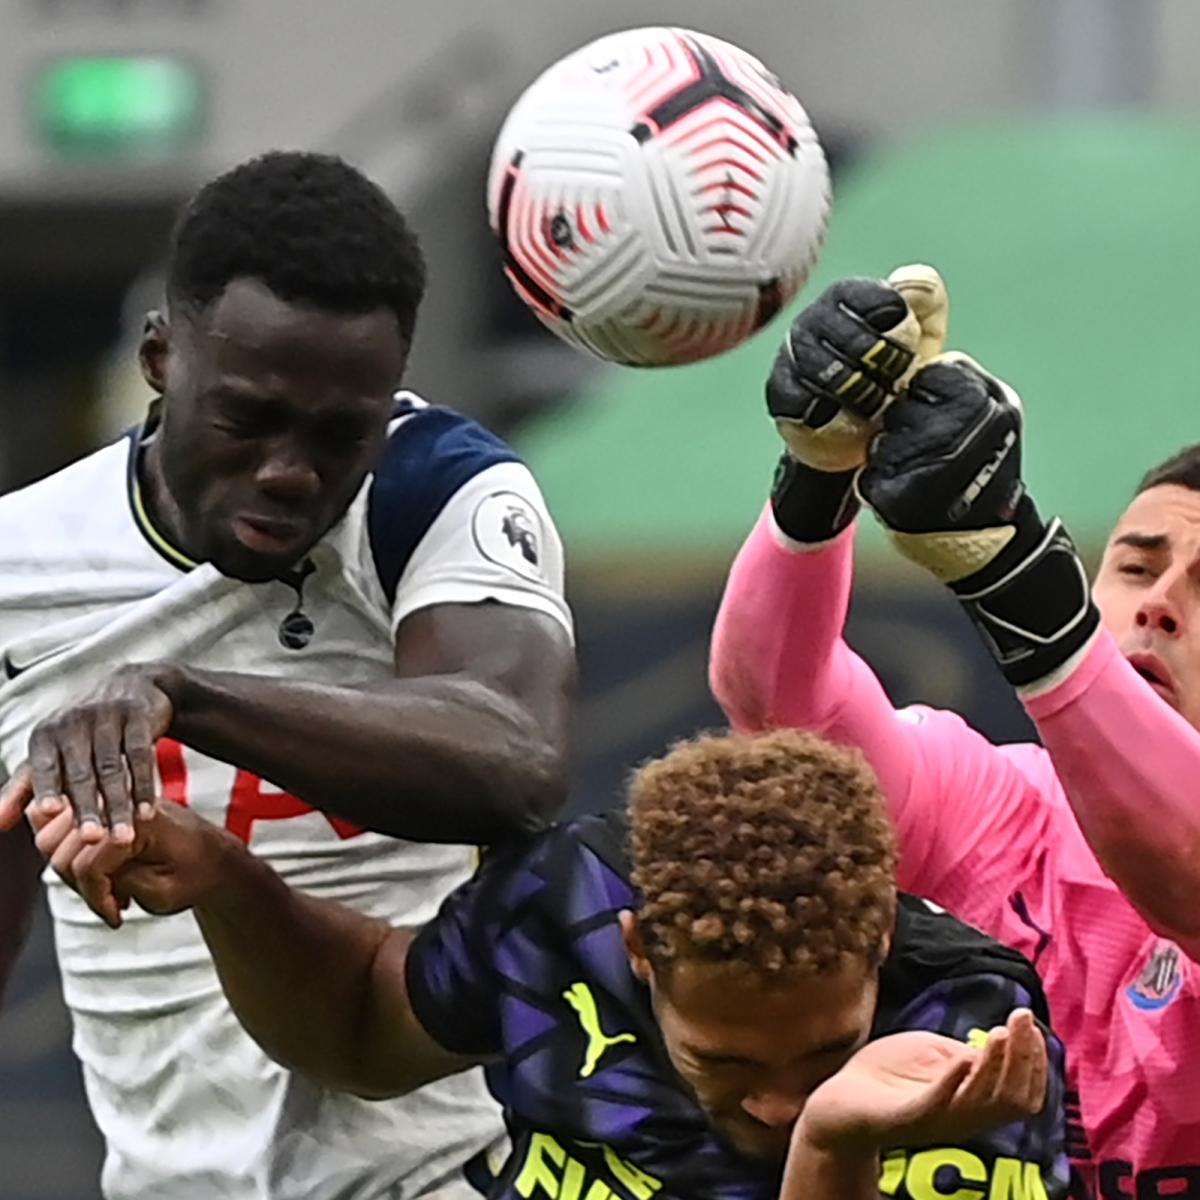 Premier League: Tottenham Hotspur falls foul of handball rule to draw with Newcastle United